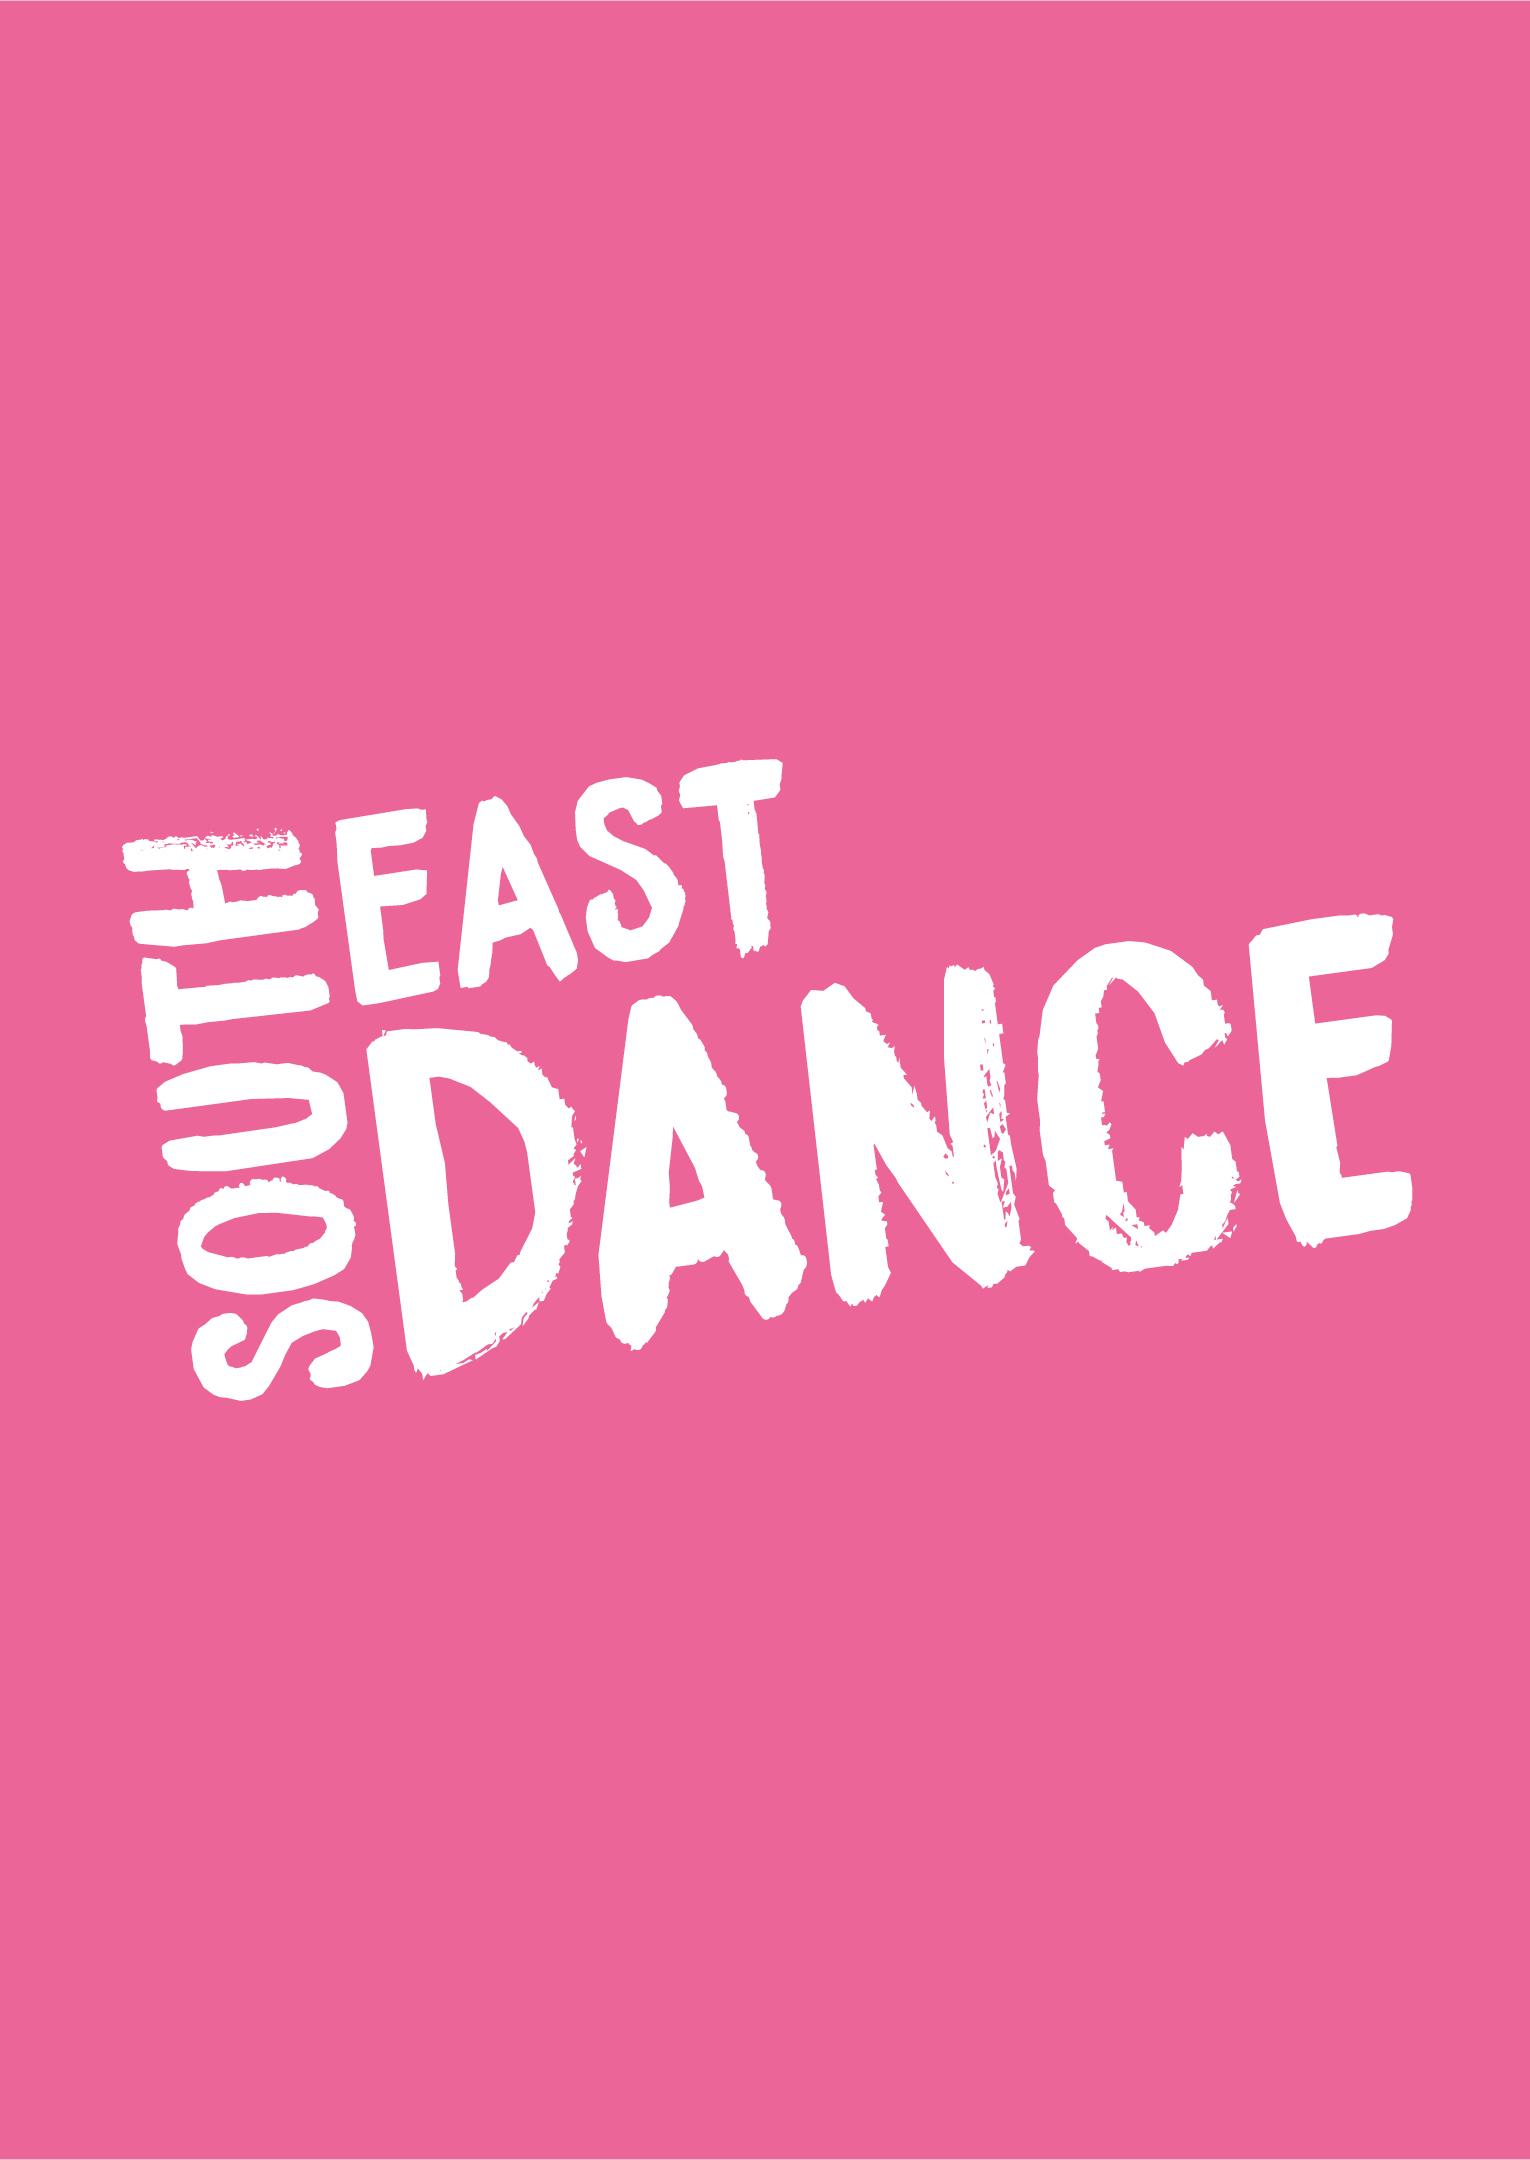 Baxter & Bailey — South East Dance